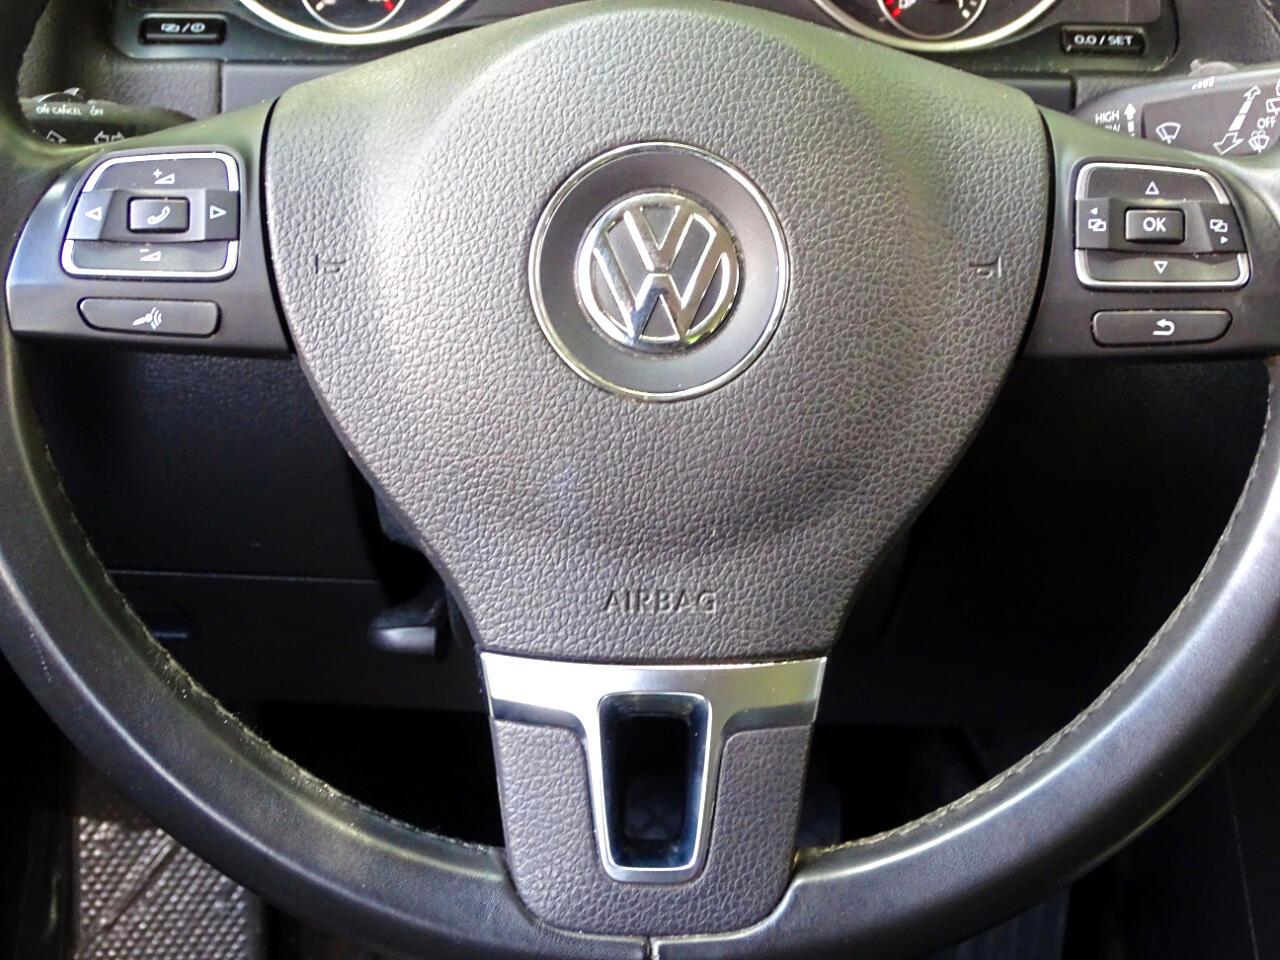 2016 Volkswagen Tiguan 4MOTION 4dr Auto S